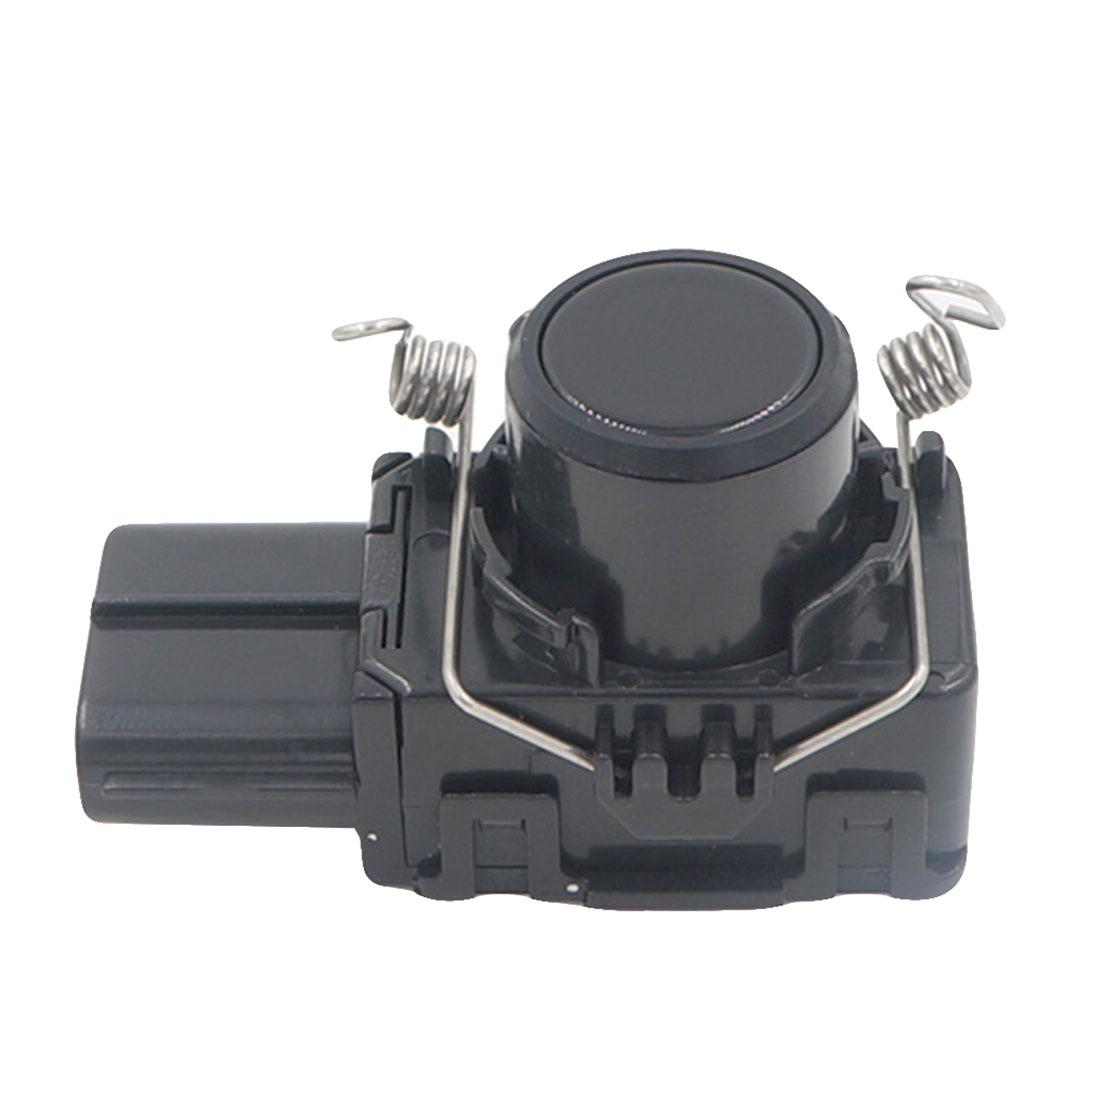 New Car Sensor 89341-28450-C0 PDC Sensore di Parcheggio Per Toyota Land Cruiser Lexus LX570 08-11